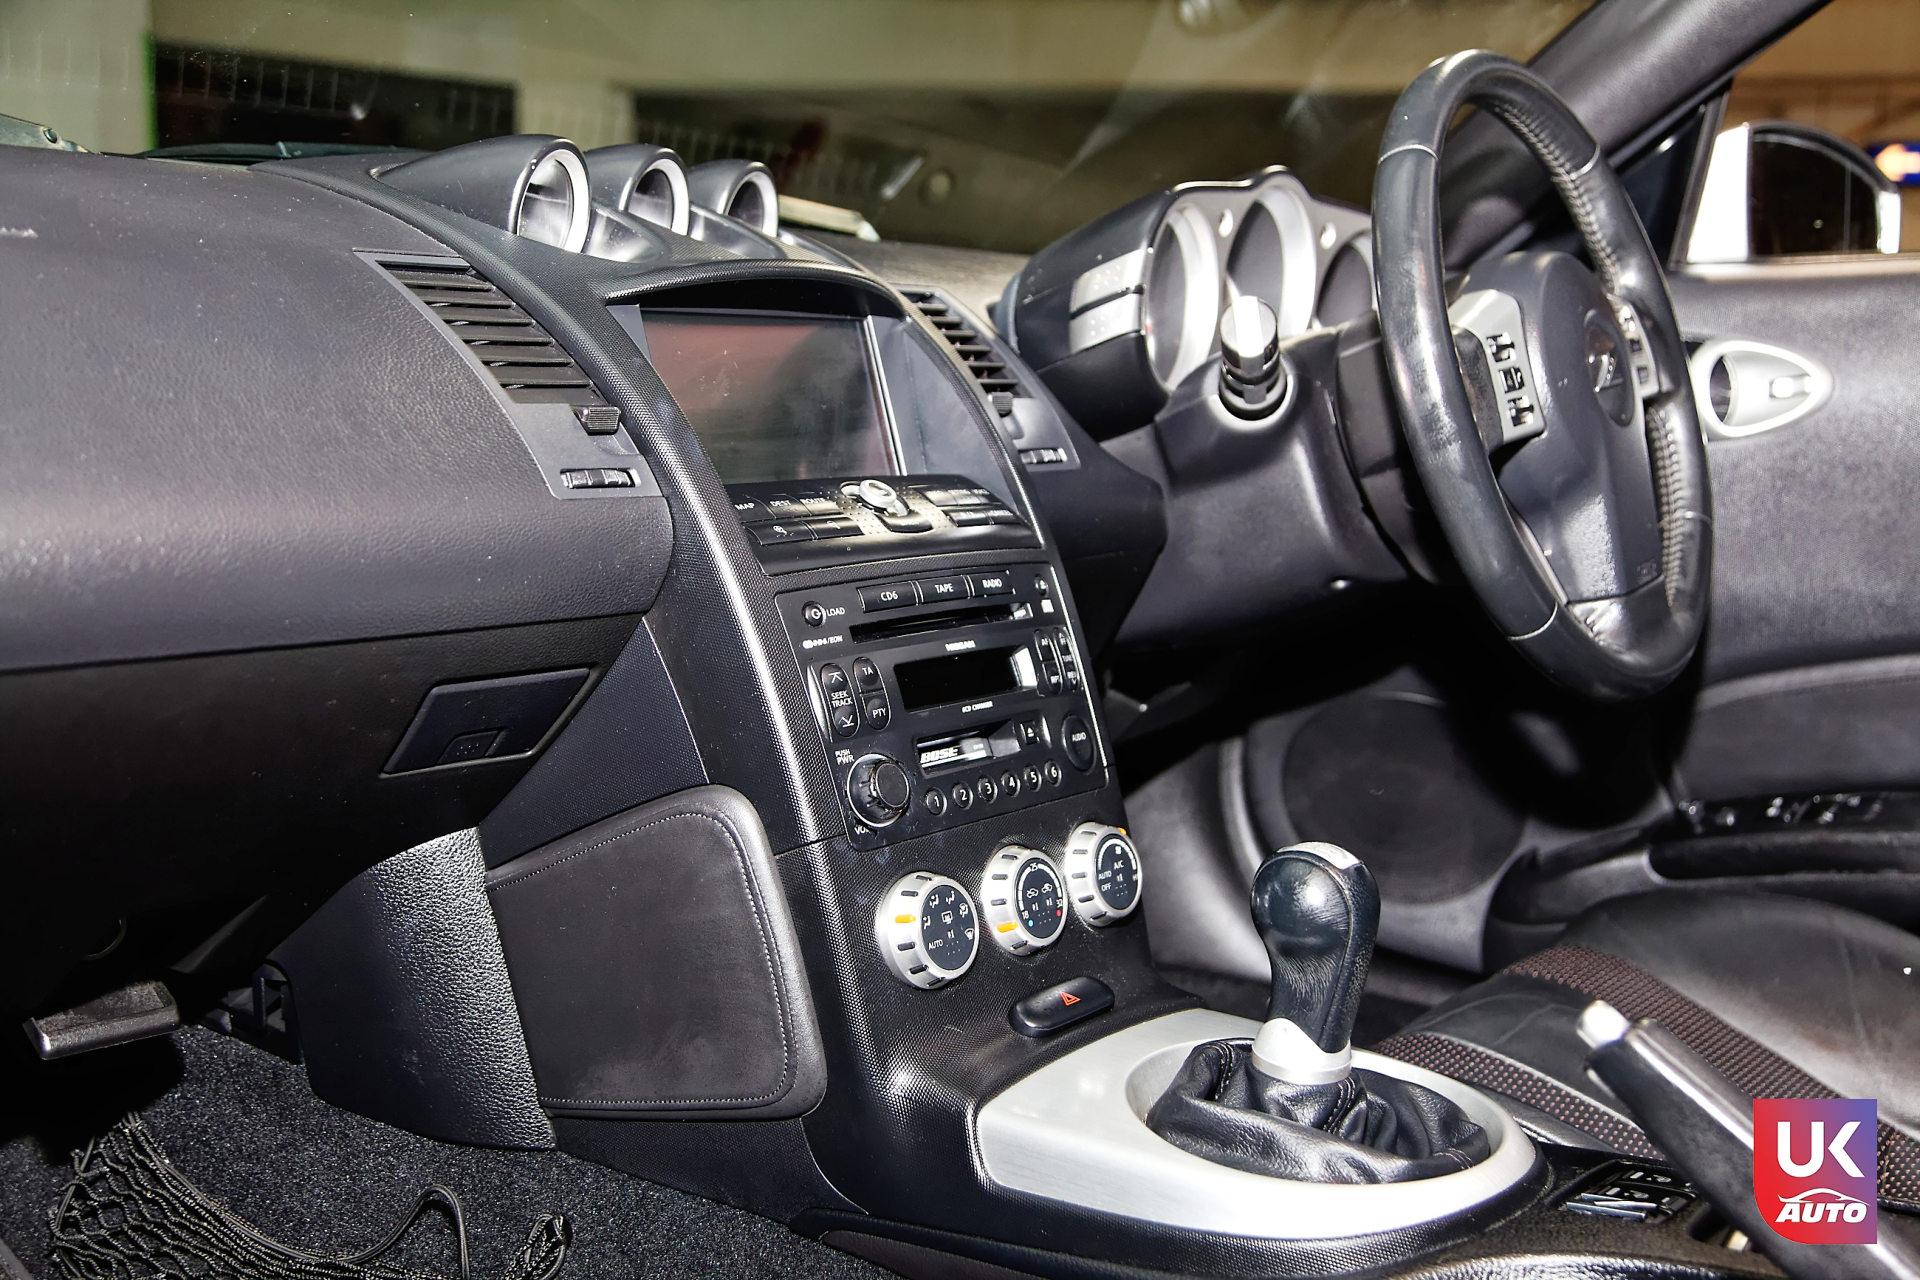 Nissan 350z rhd v6 nissan angleterre nissan uk nissan import rhd voiture occasion mandataire nissan 8 DxO - NISSAN ANGLETERRE IMPORT NISSAN 350Z V6 RHD 3.5 MANDATAIRE NISSAN AUTO AVANT LE BREXIT FELICITATION A XABI